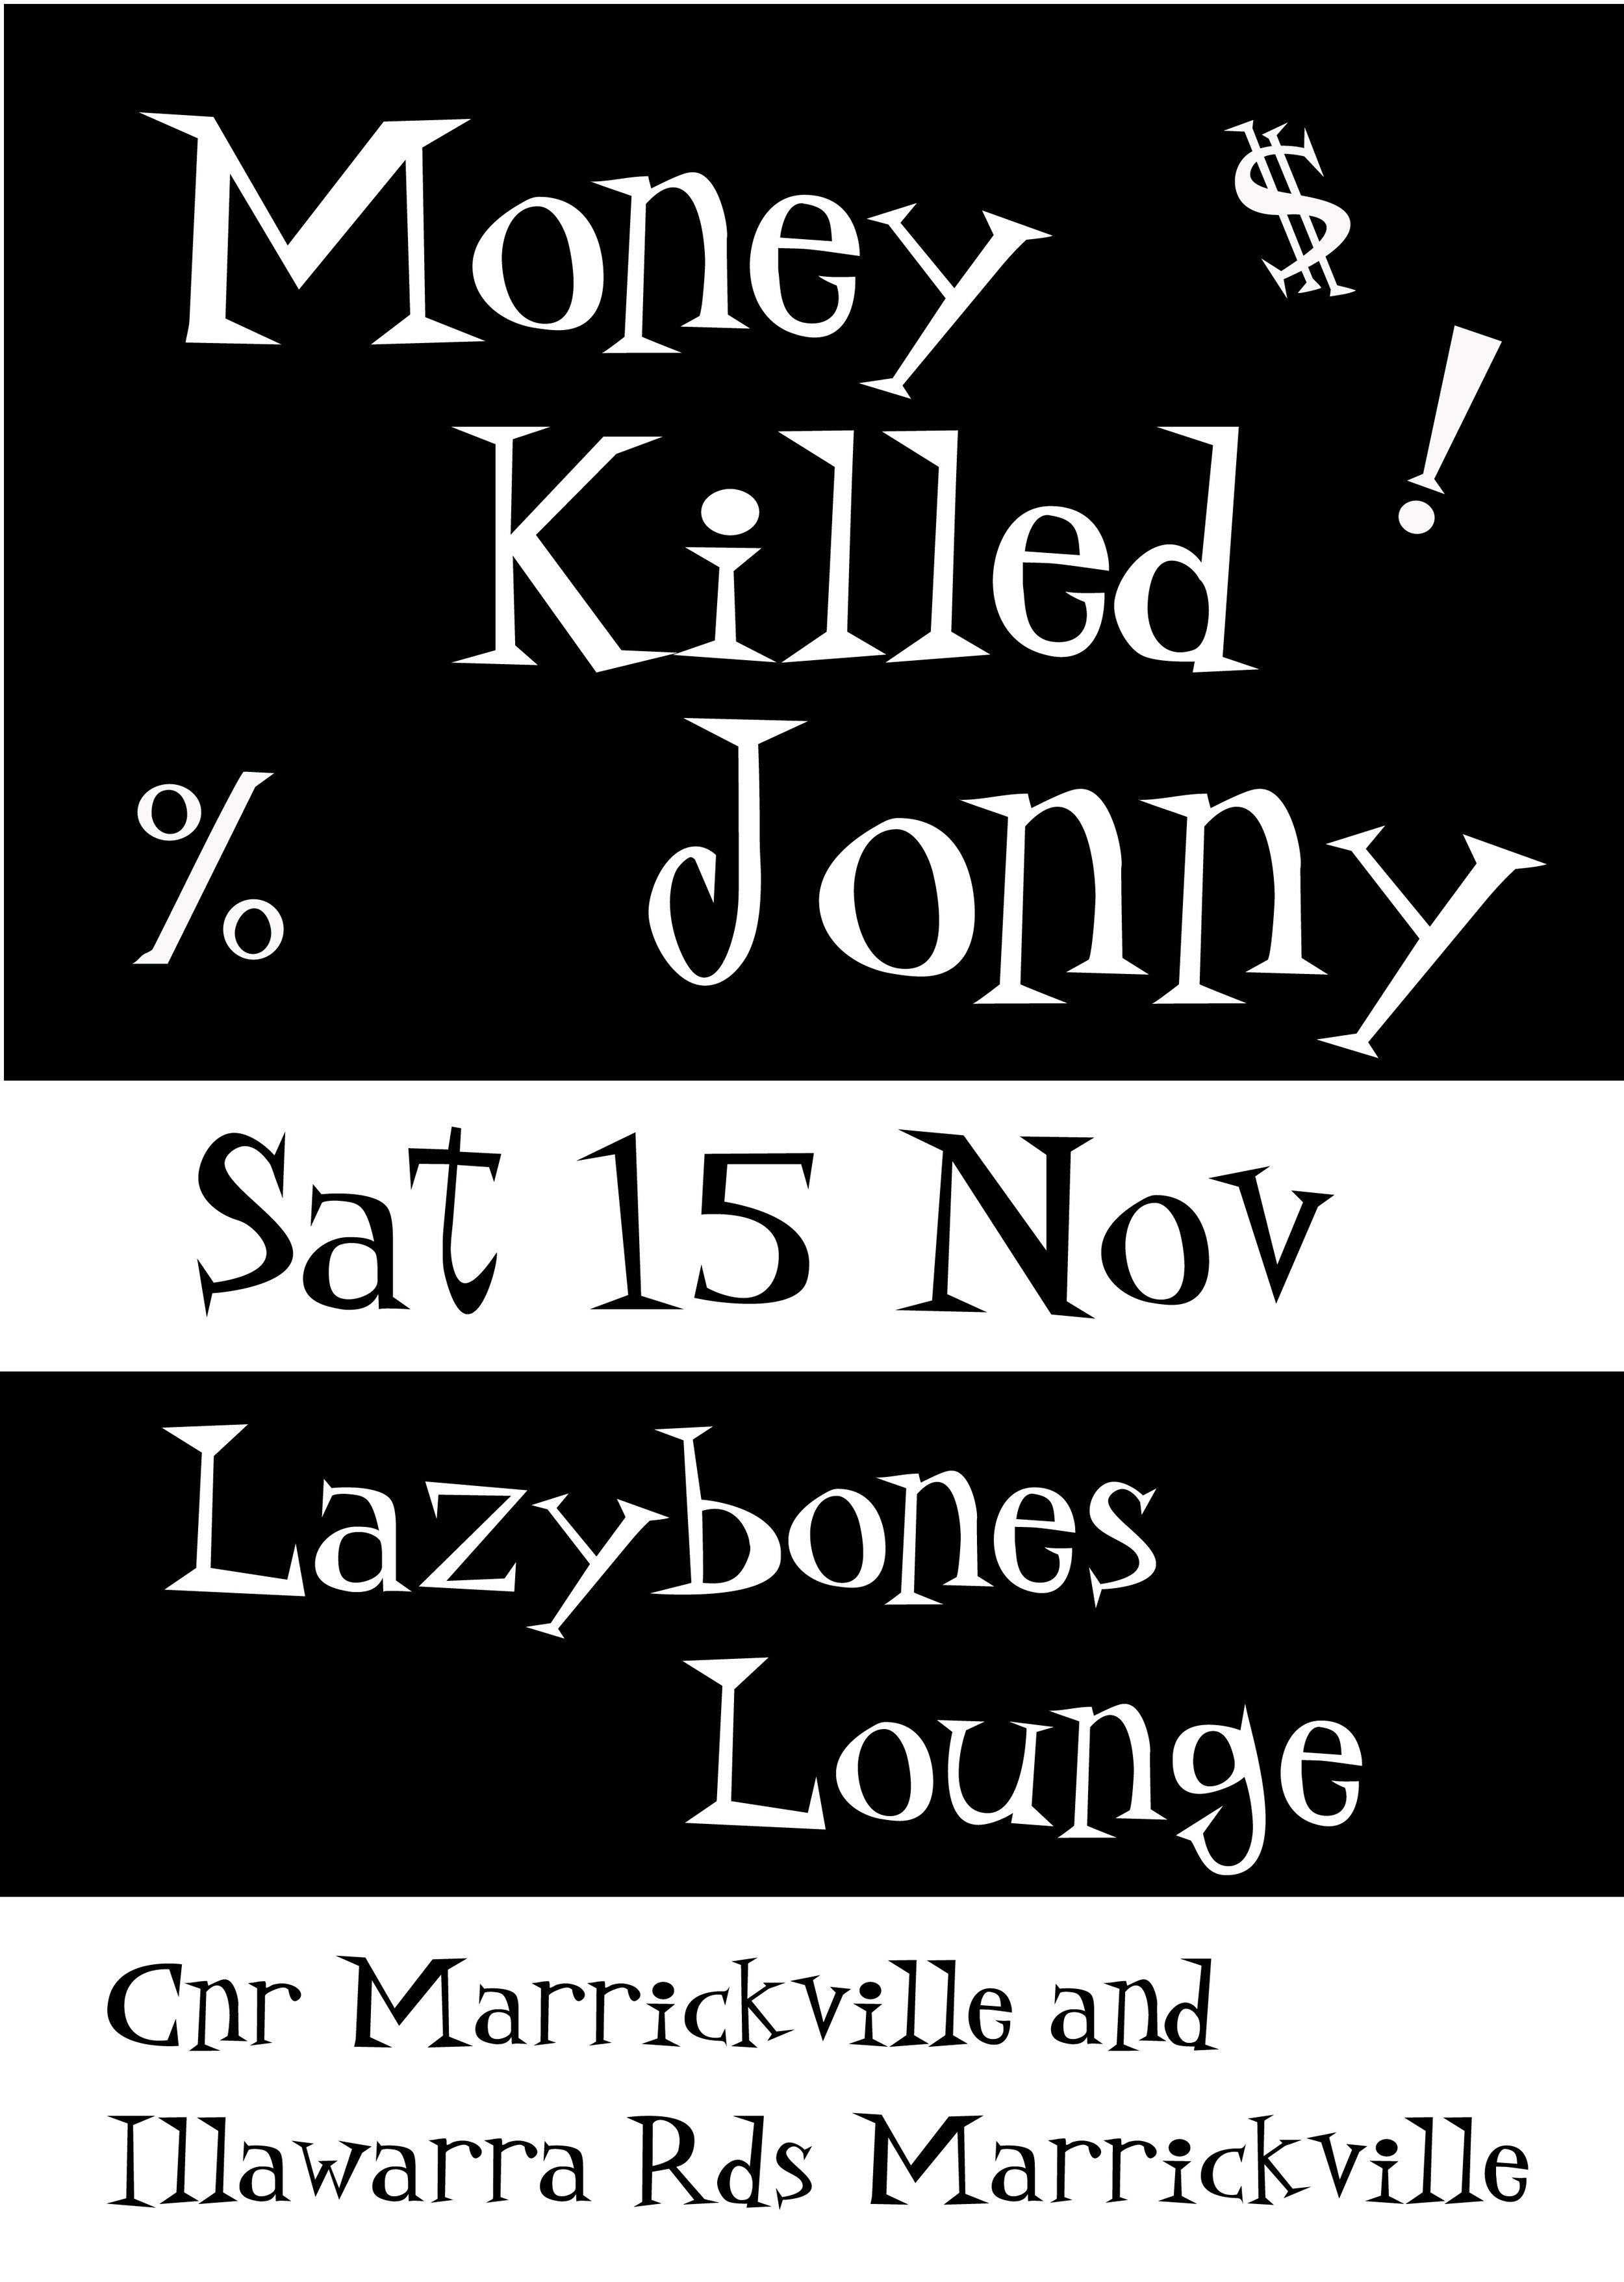 Lazybones Poster.jpg